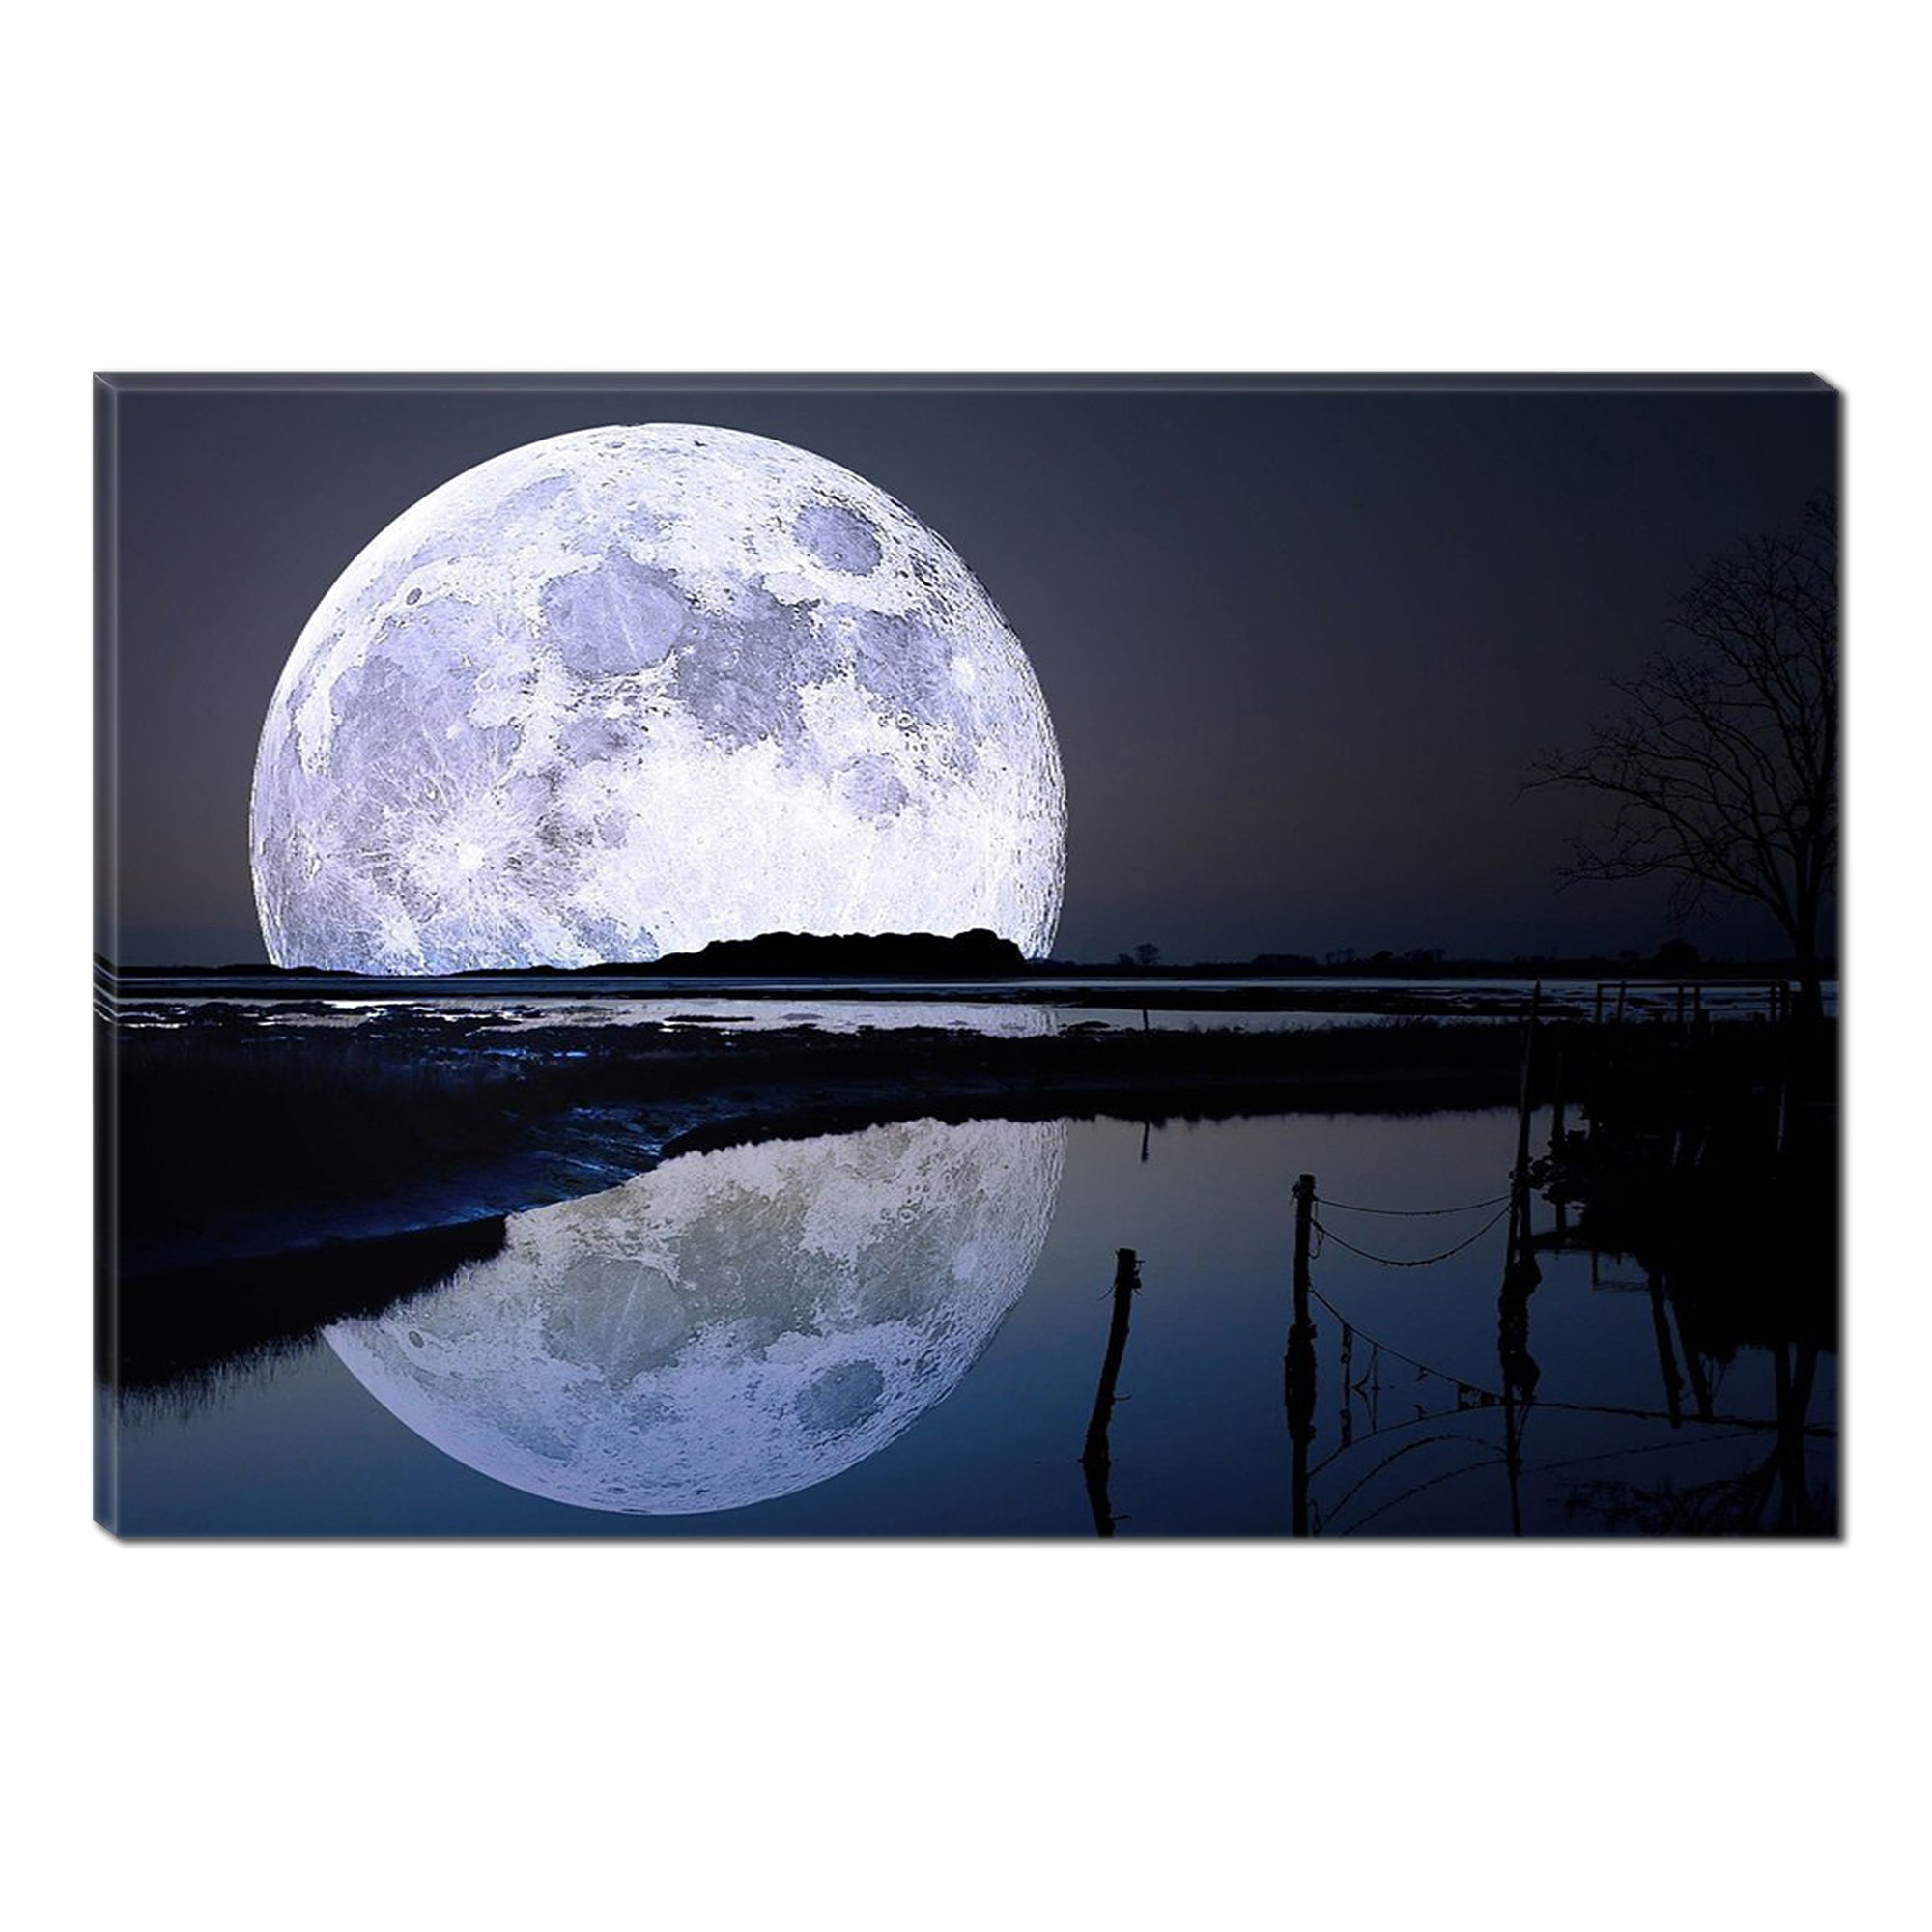 Fotografie Tablou DualView Startonight Luna Plina Uriasa, Albastru, Luminos in intuneric, 70 x 100 cm